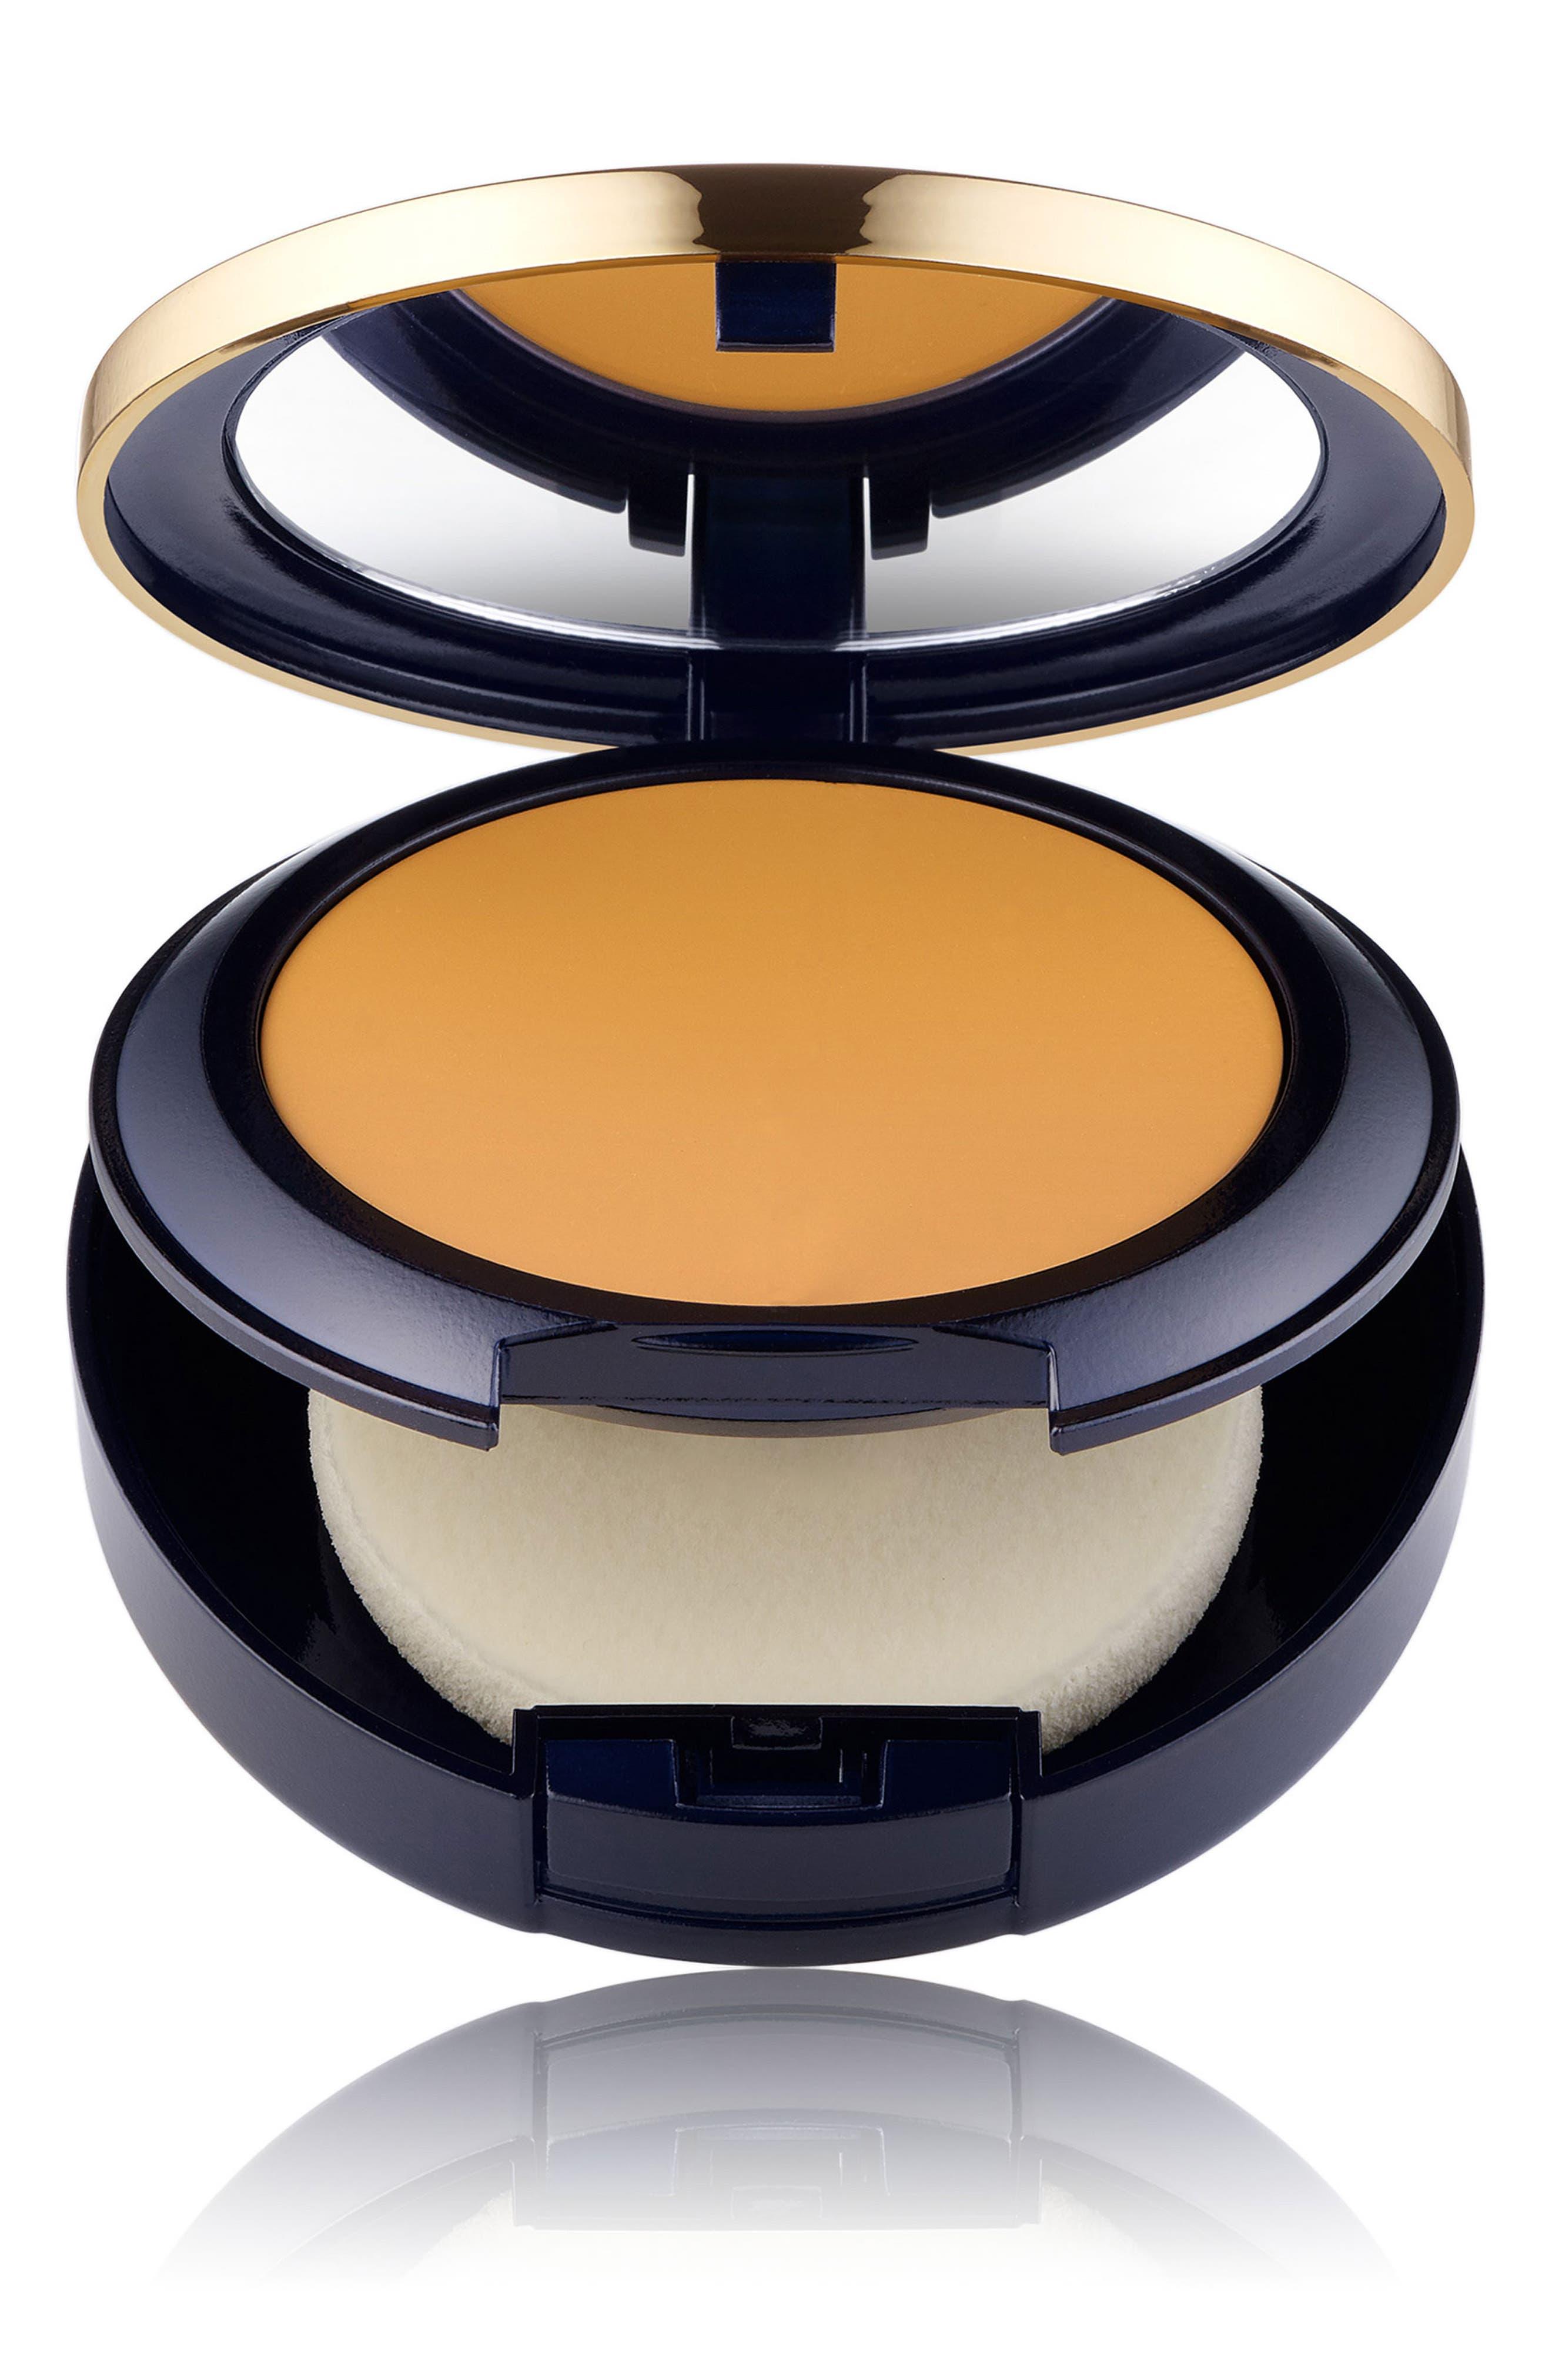 Estee Lauder Double Wear Stay In Place Matte Powder Foundation - 5N1.5 Maple